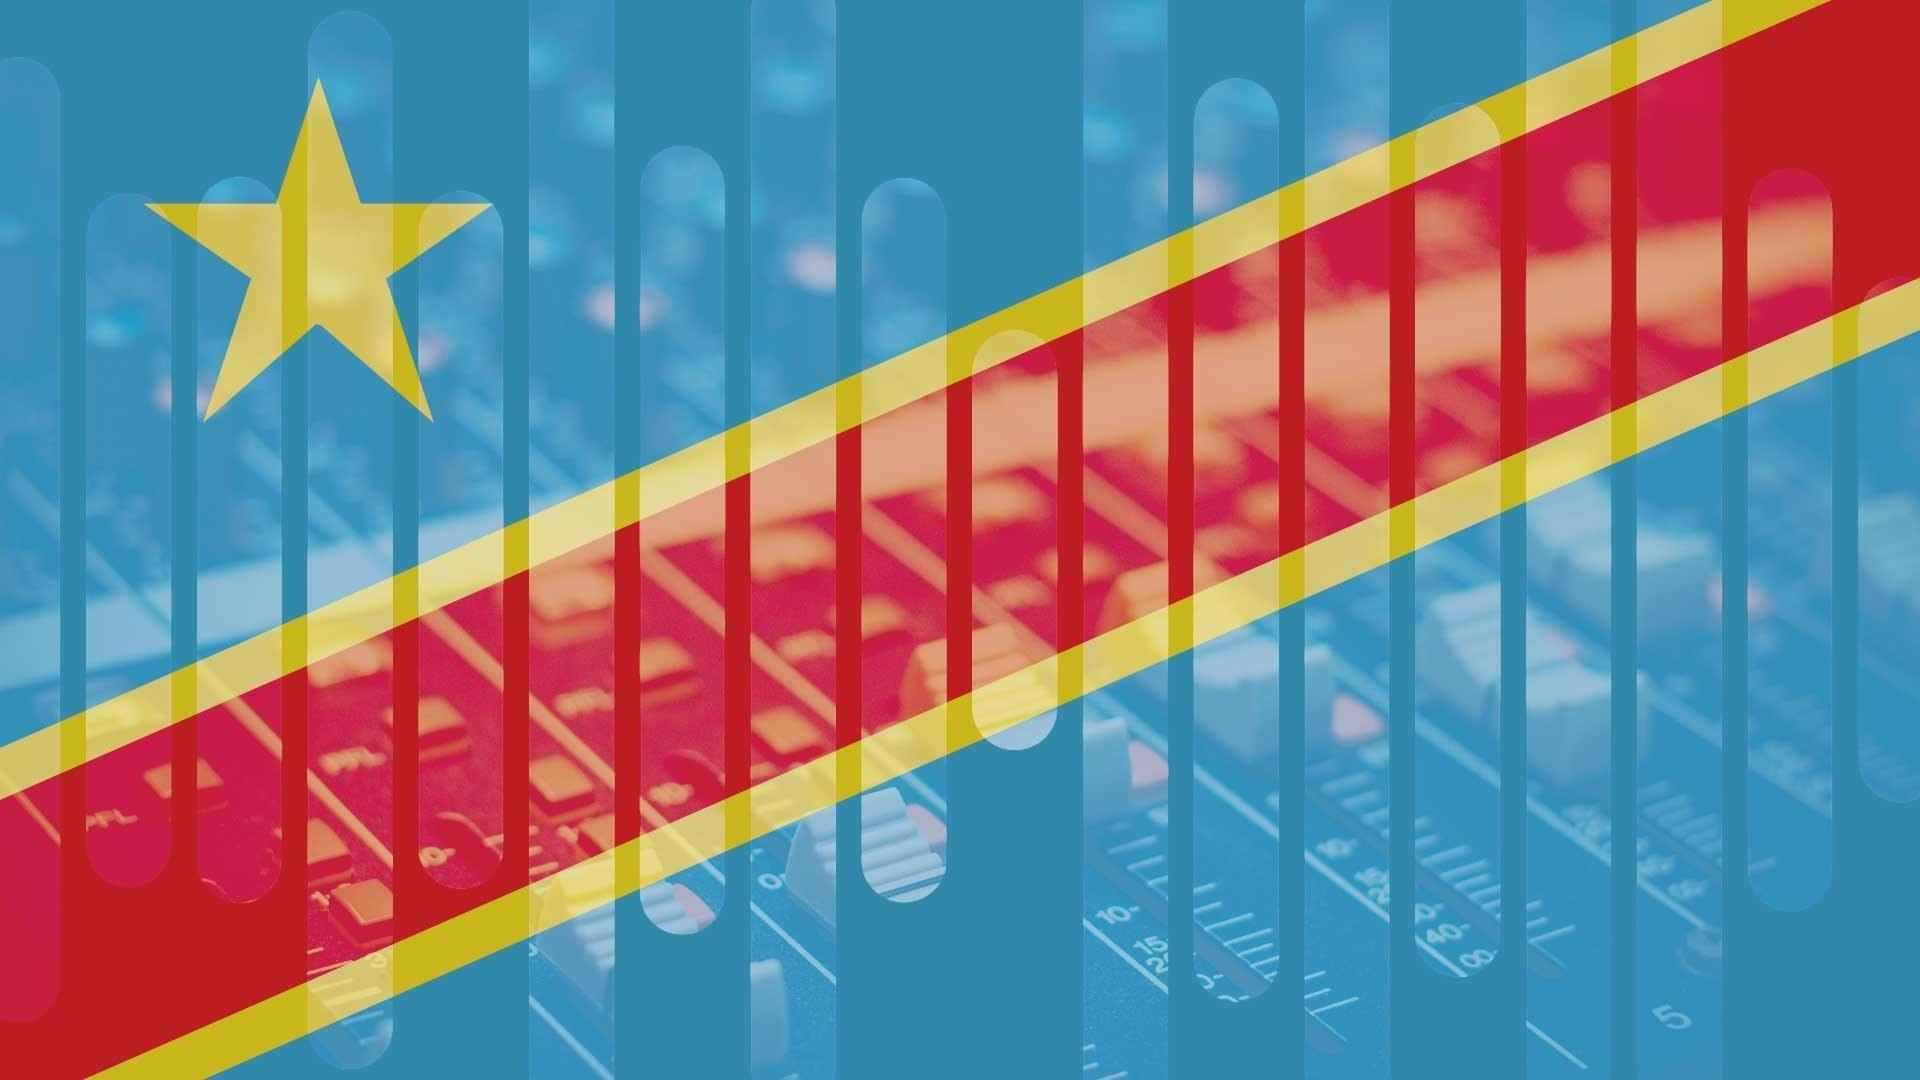 Voice-Over Services Democratic Republic of the Congo - Voquent